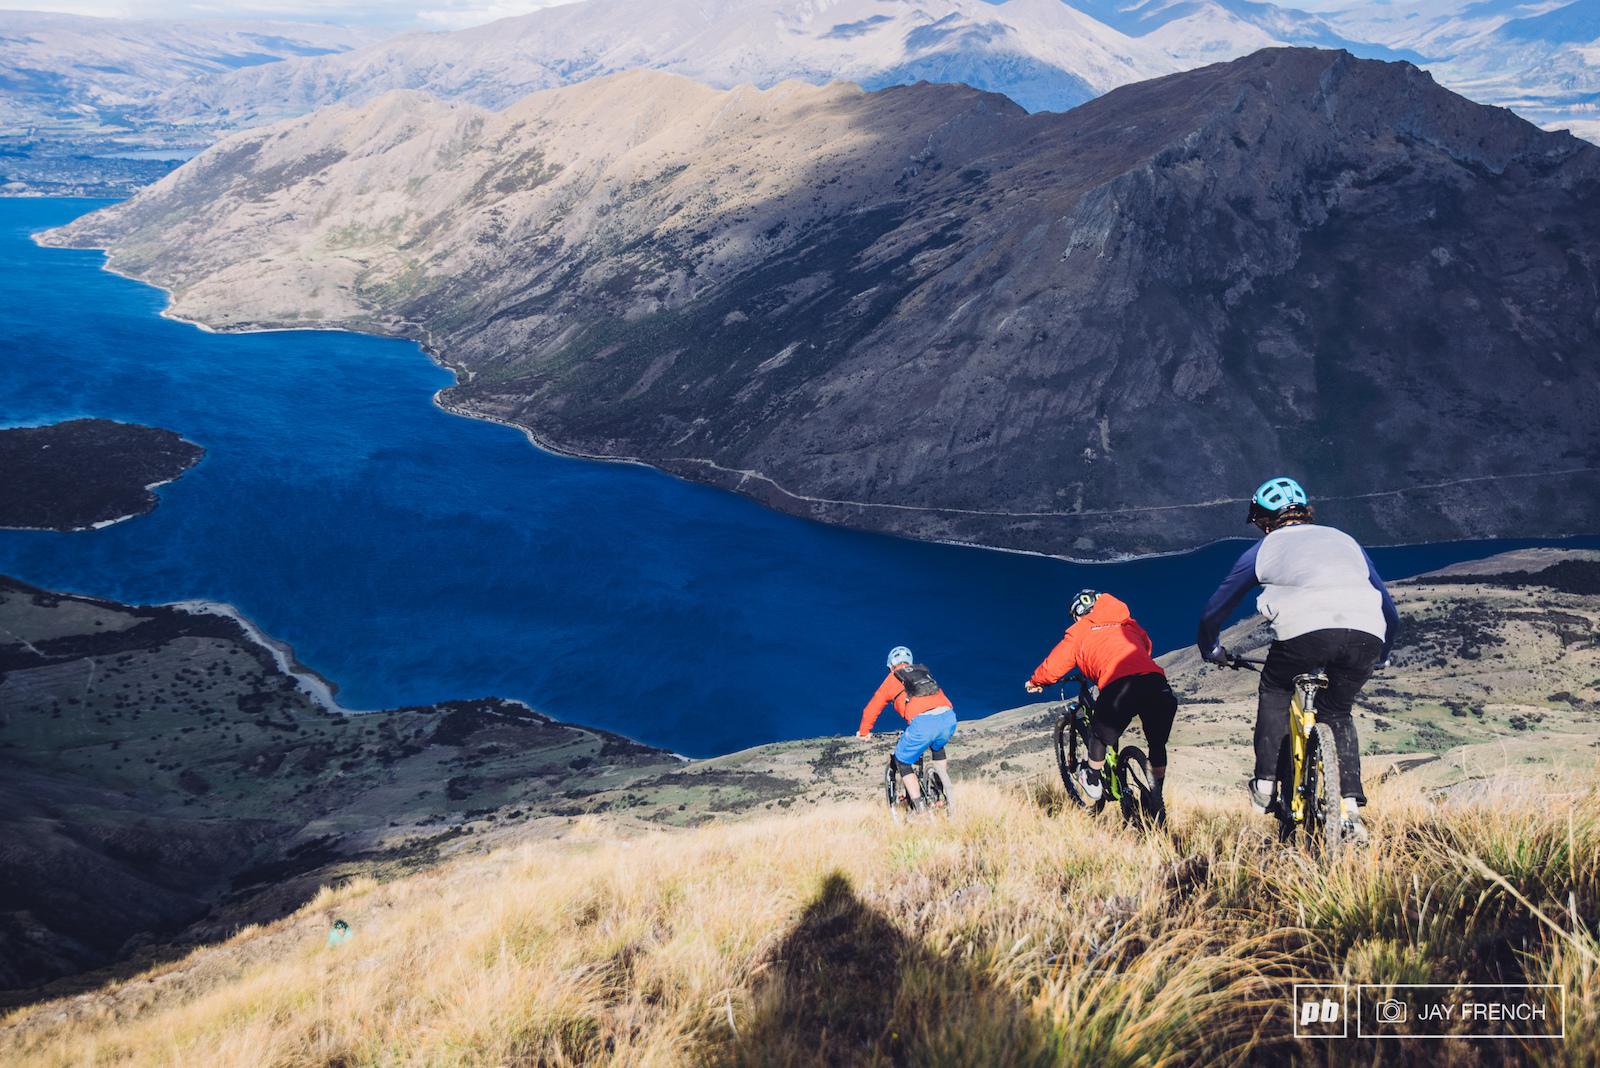 The boys head straight down a ridge line towards the lake